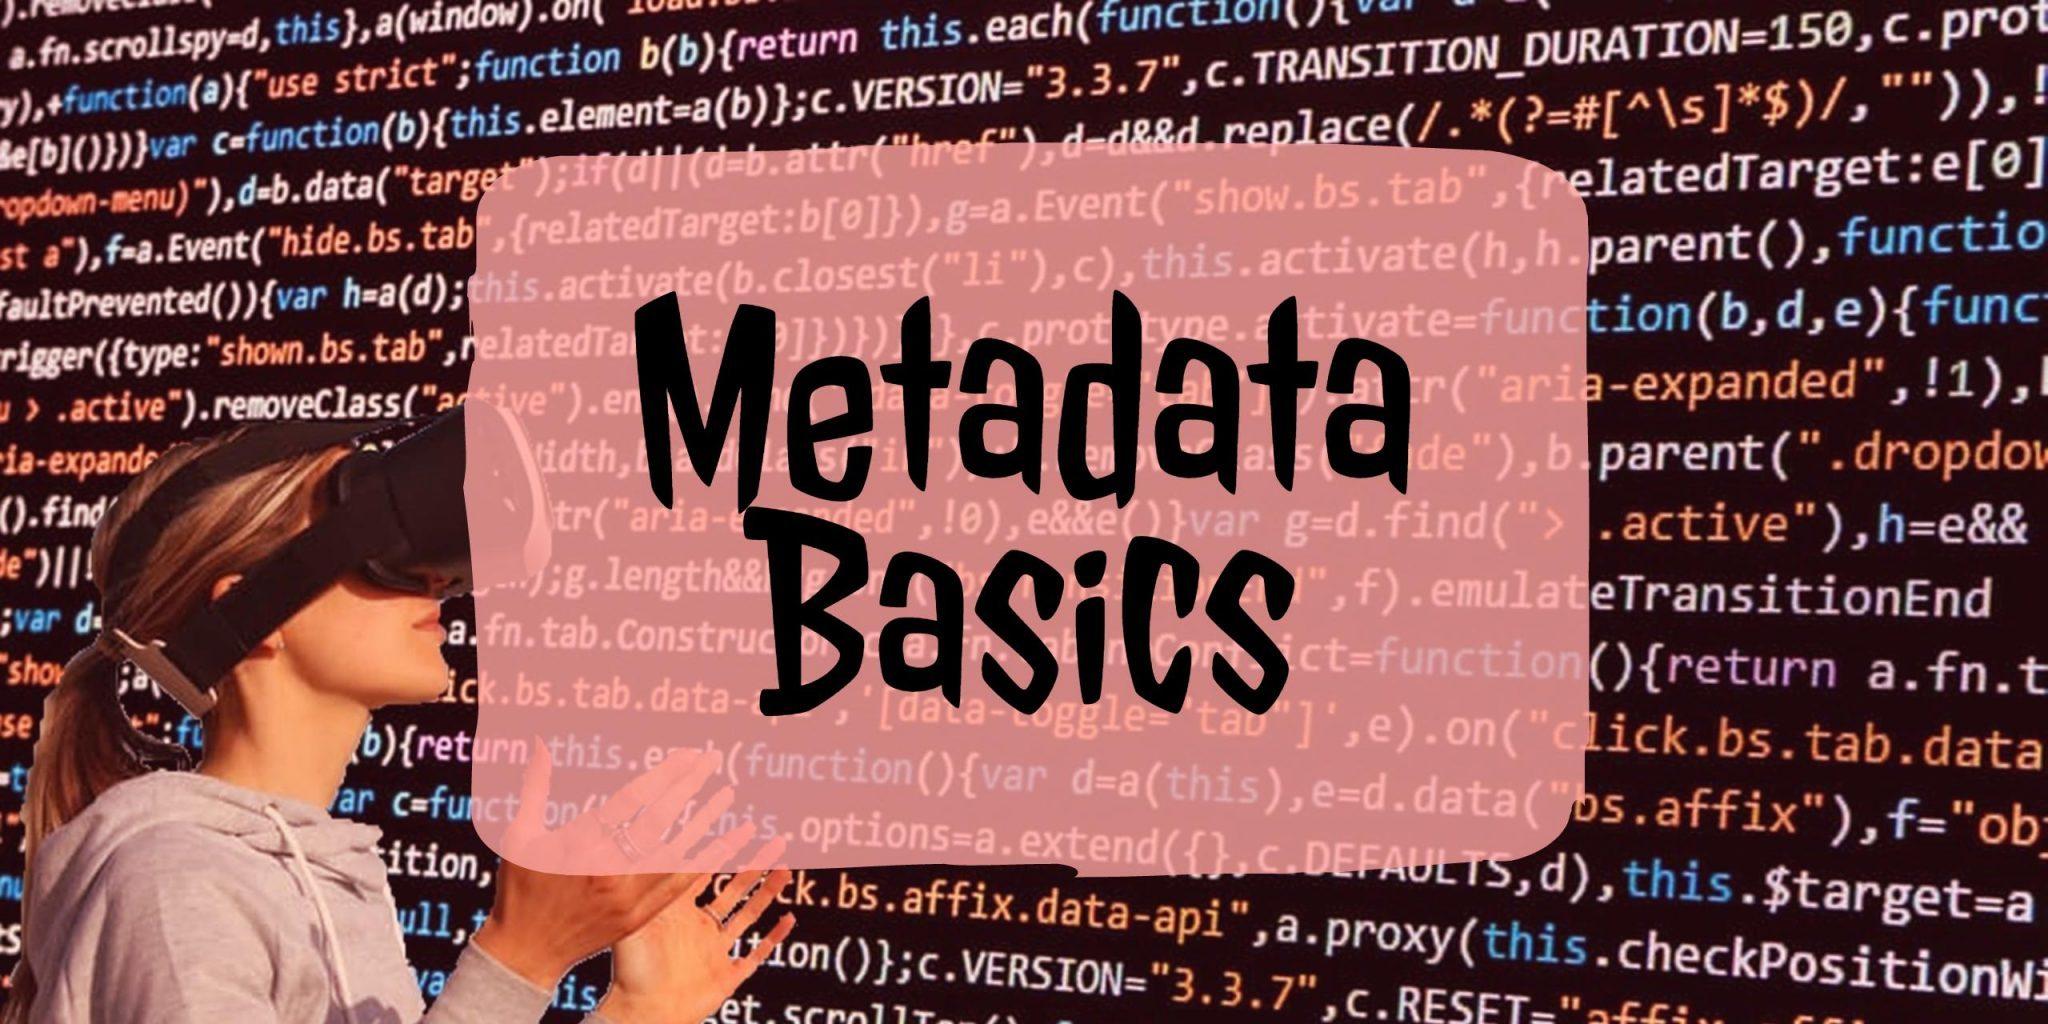 Metadata basics